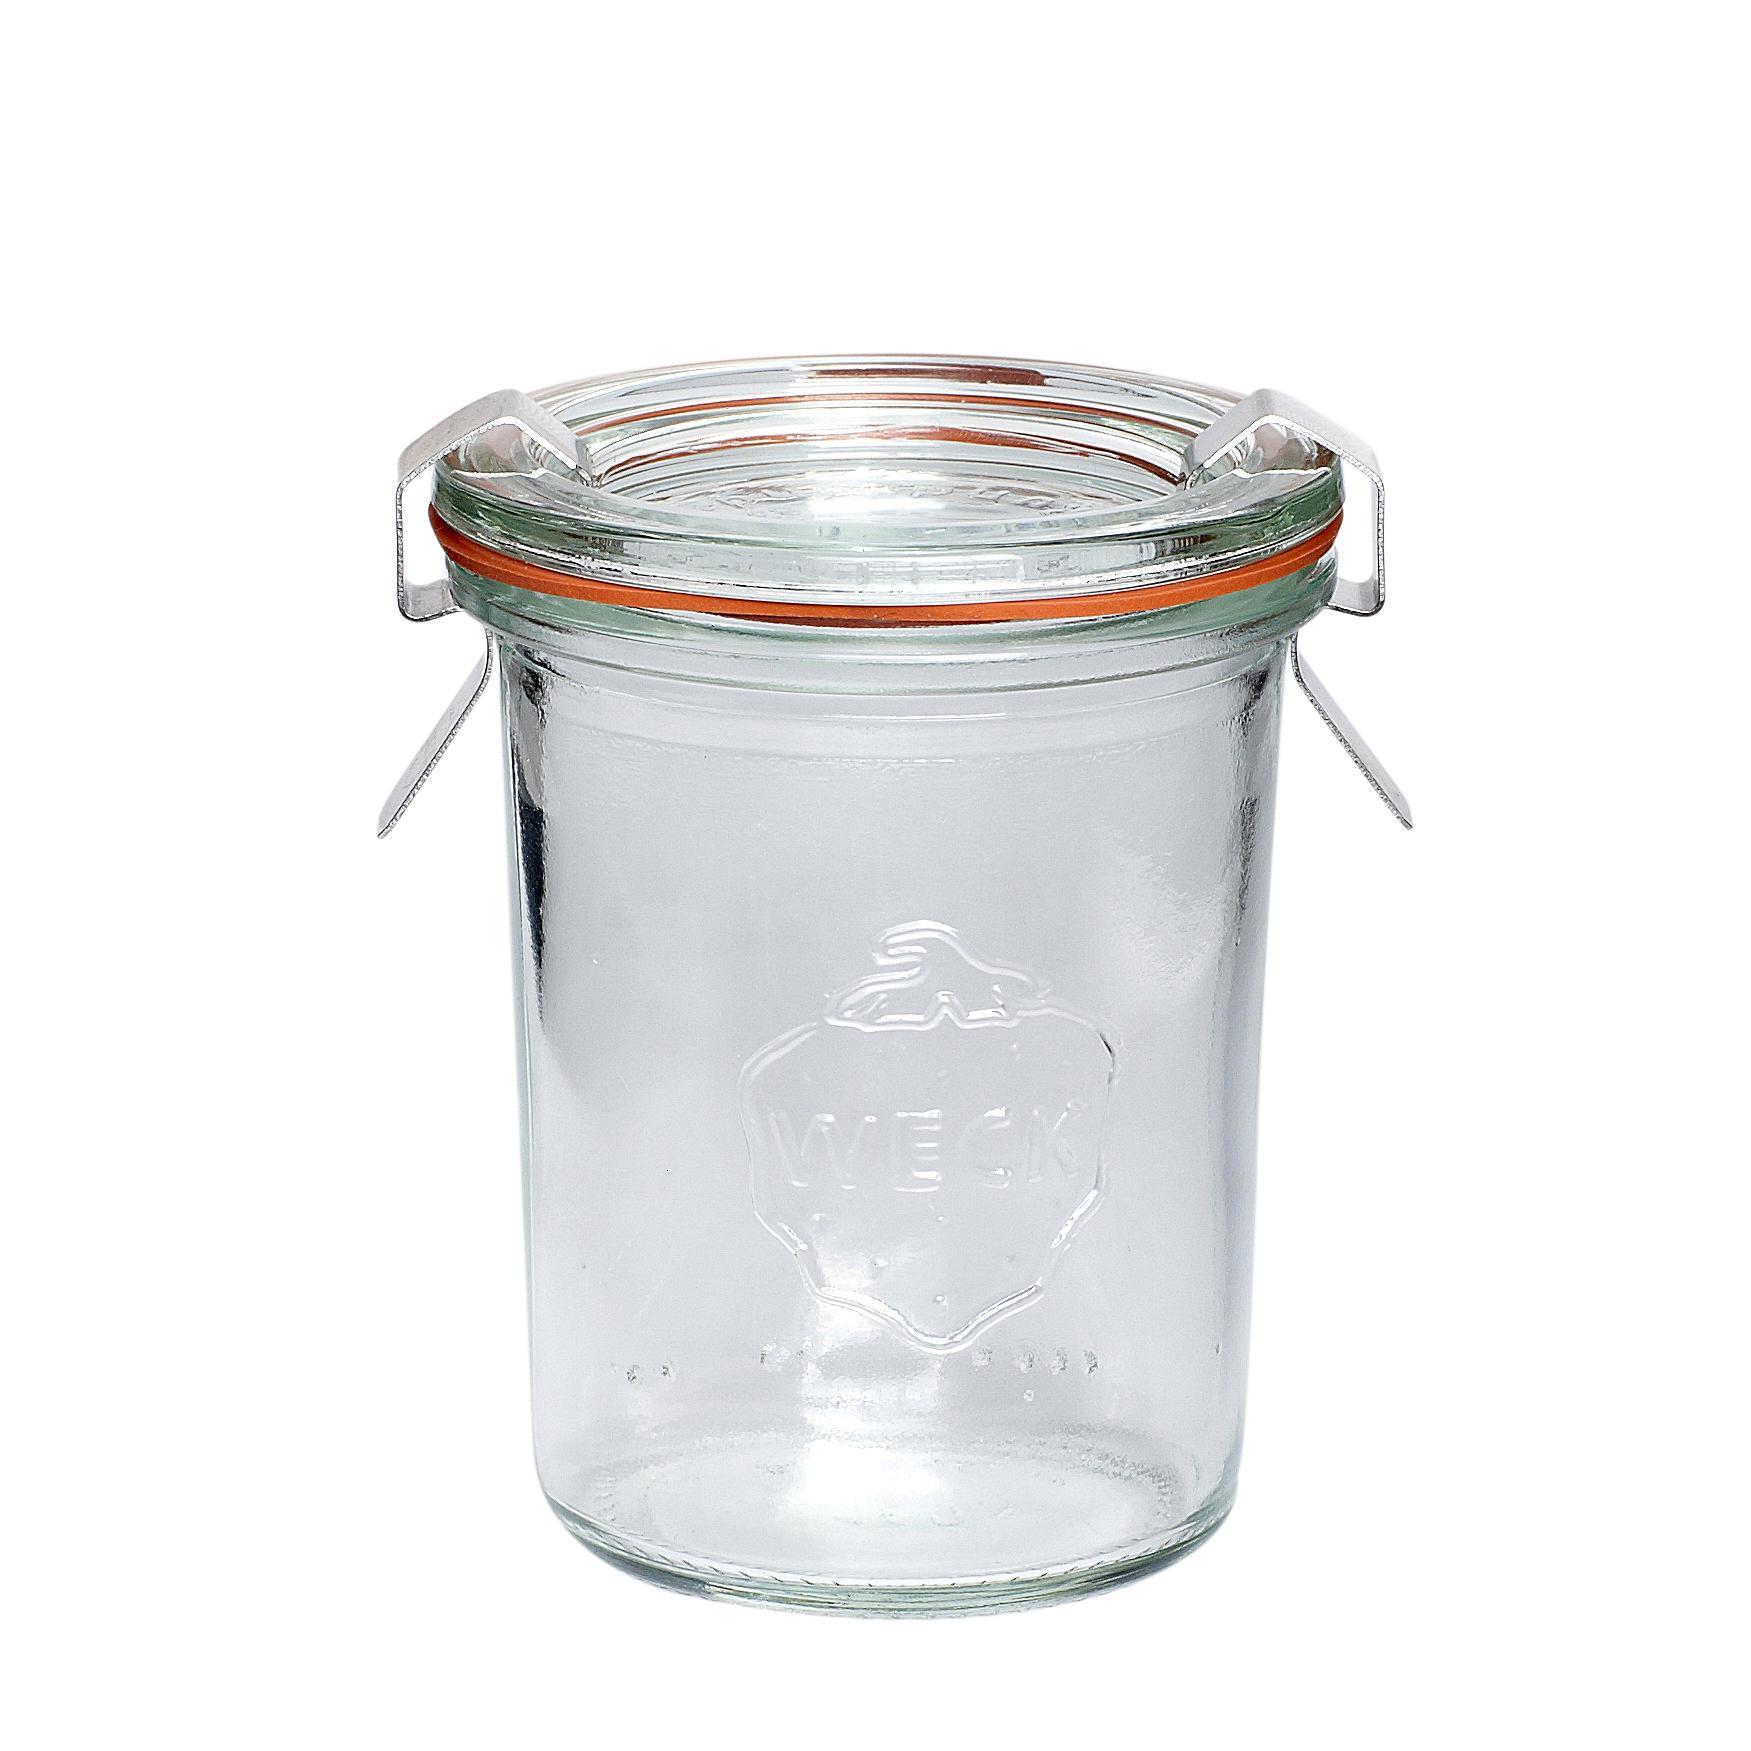 Hübsch Skleněná dóza Weck 160 ml, čirá barva, sklo